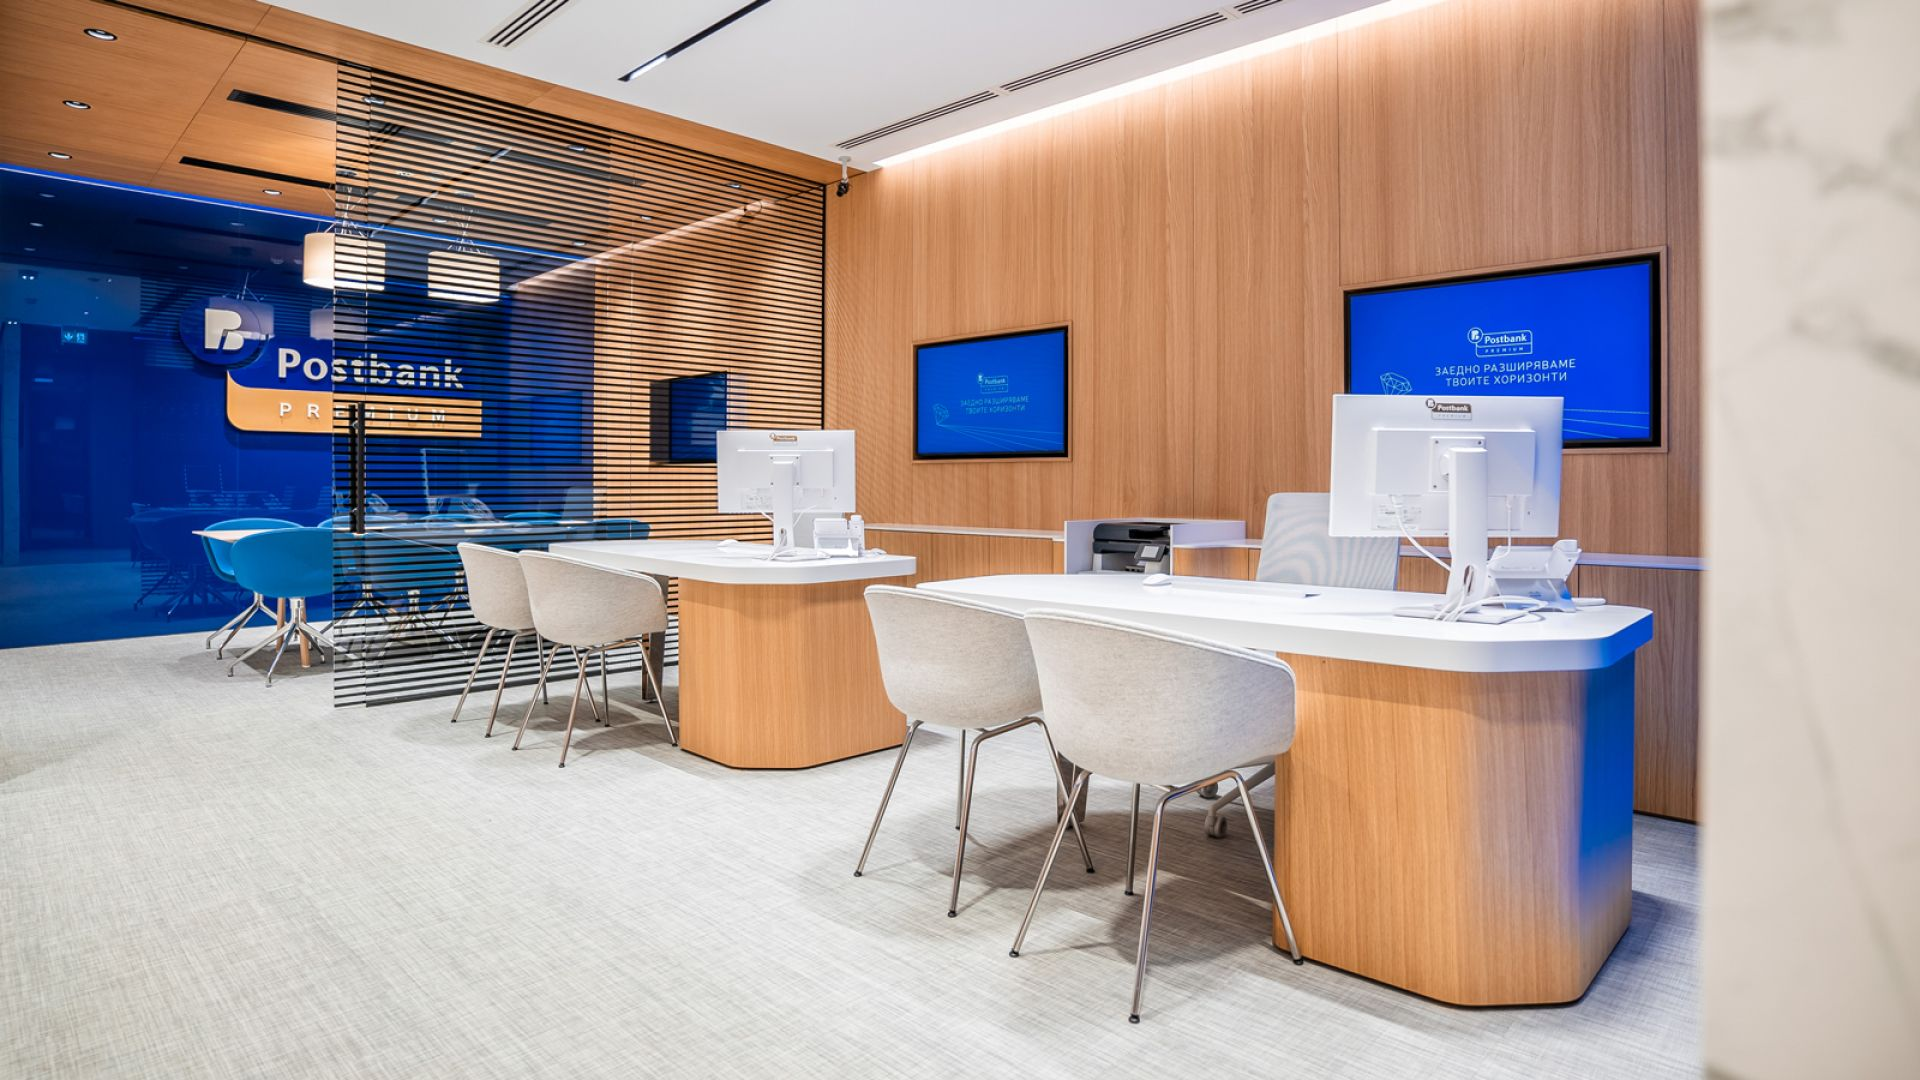 Пощенска банка откри своите уникални Premium Banking центрове